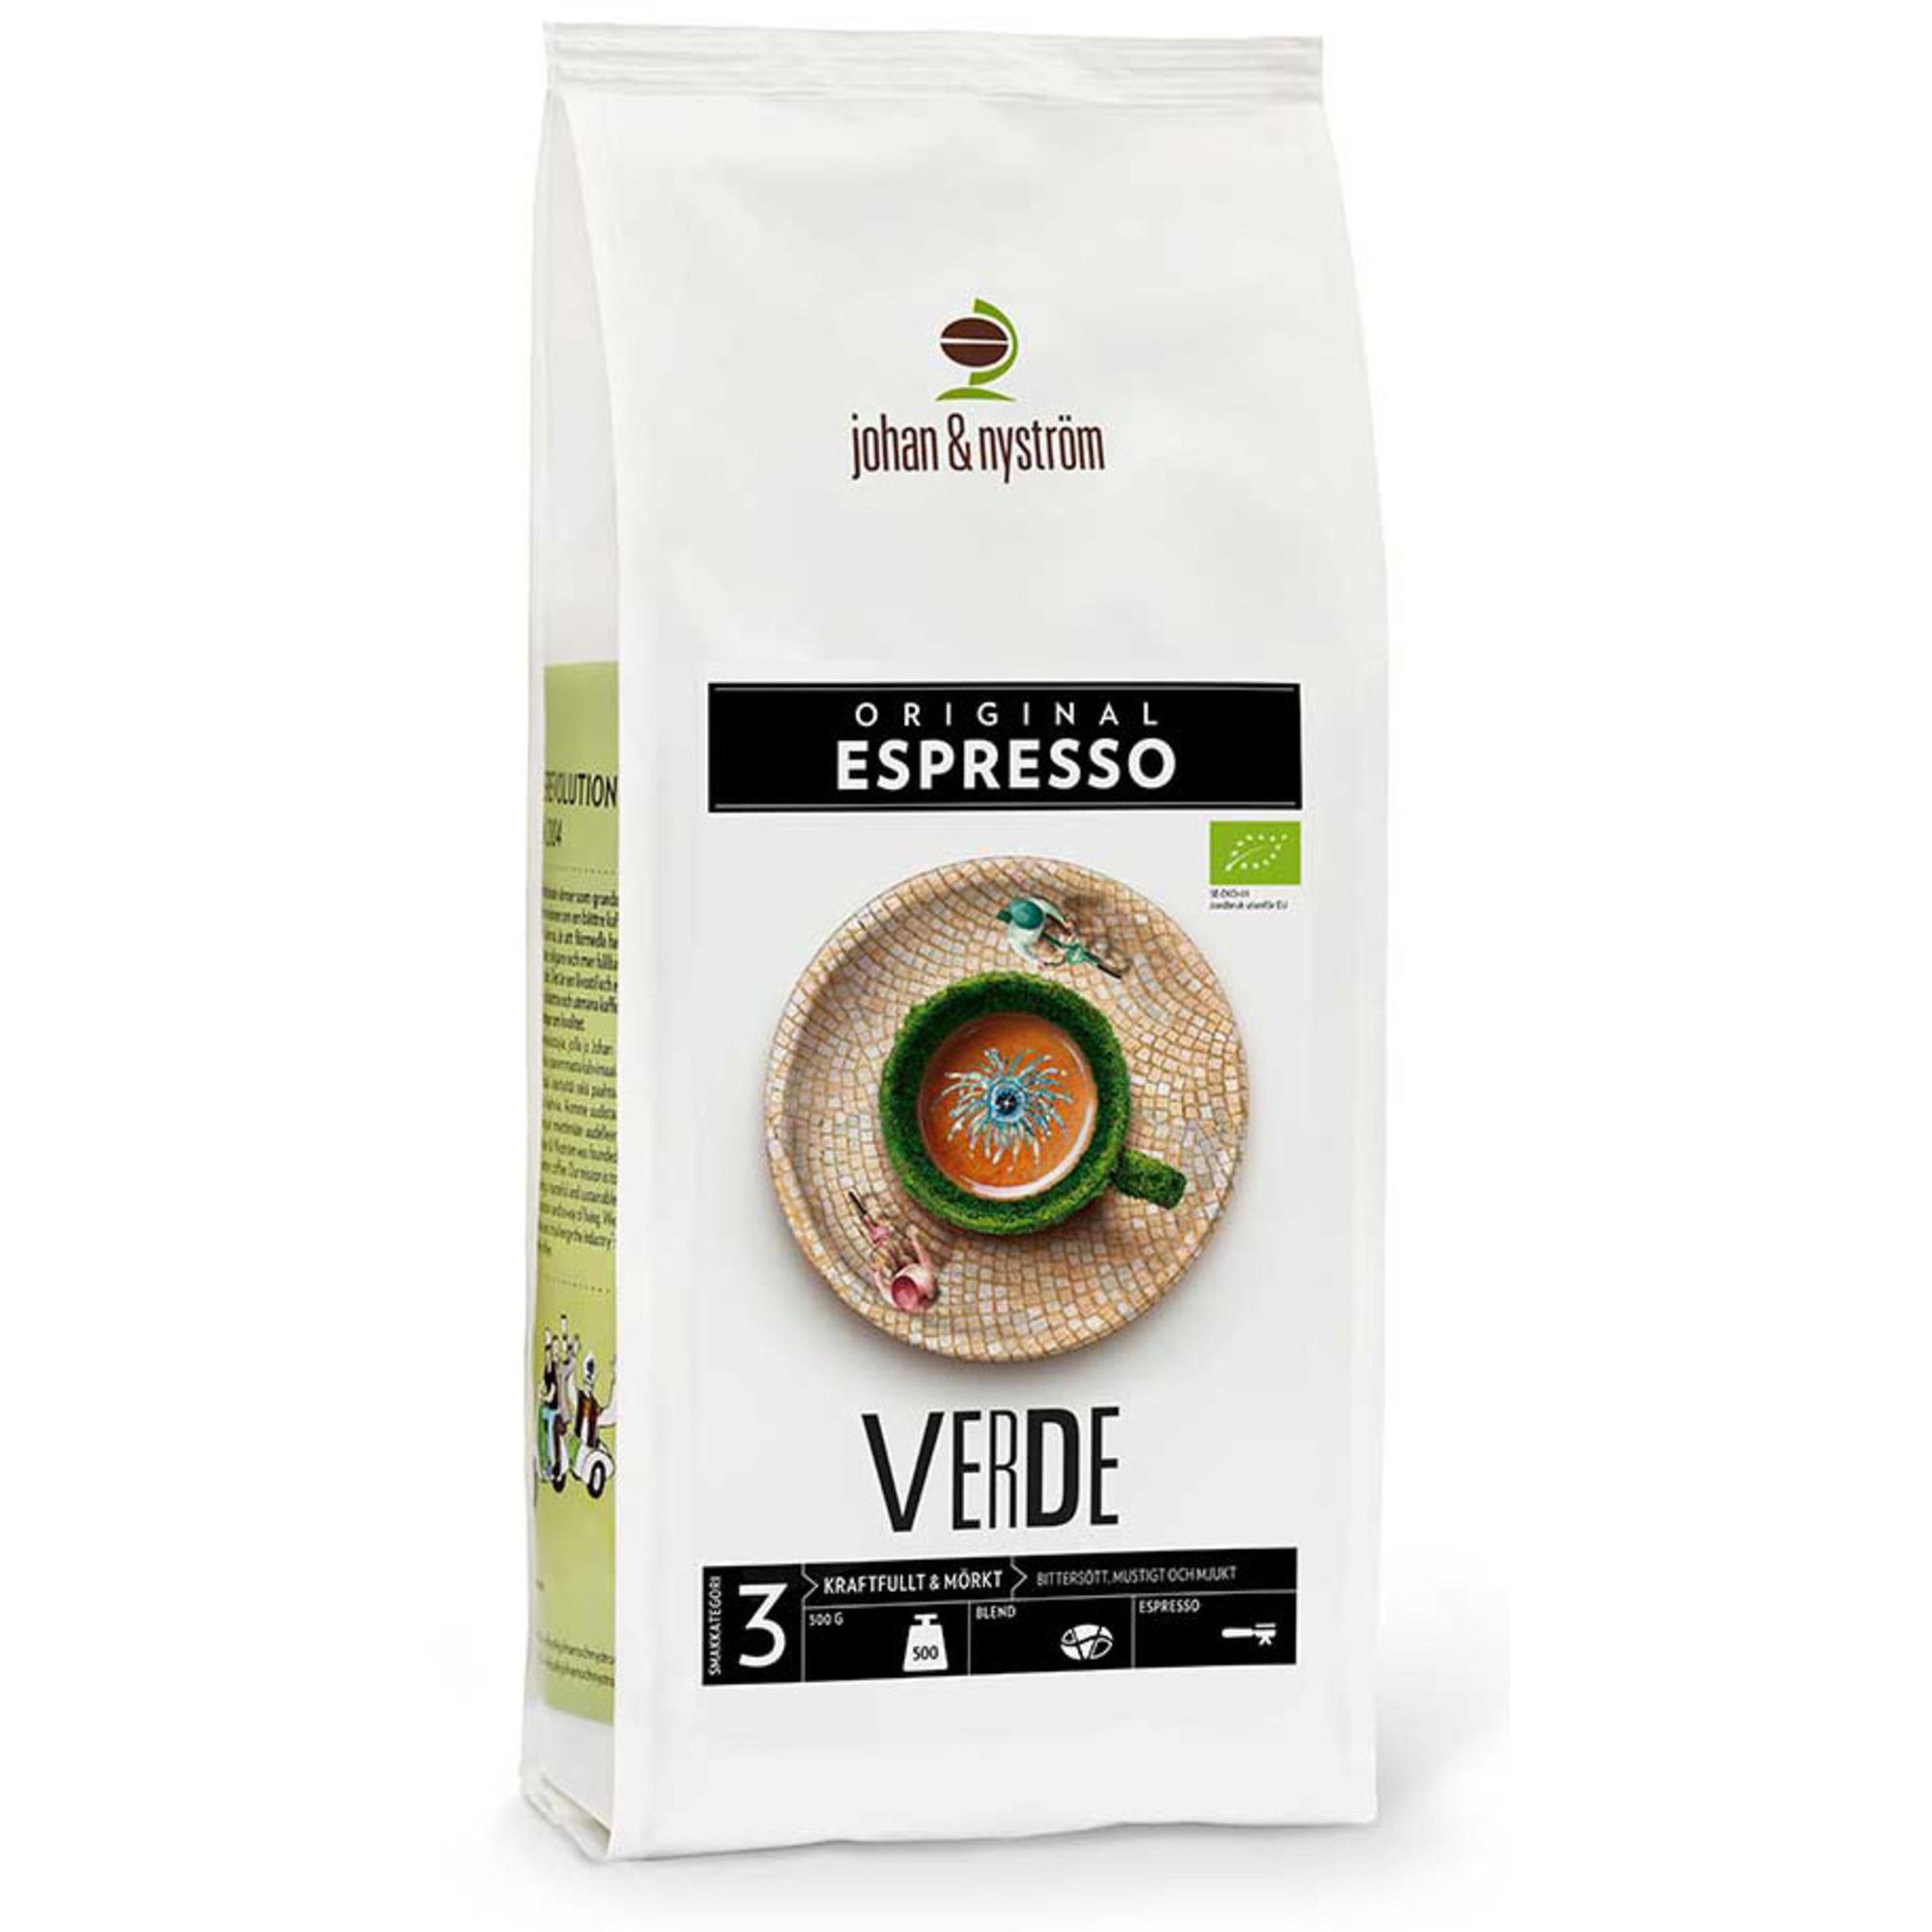 Johan & Nyström Espresso Verde Ekologiskt 500g